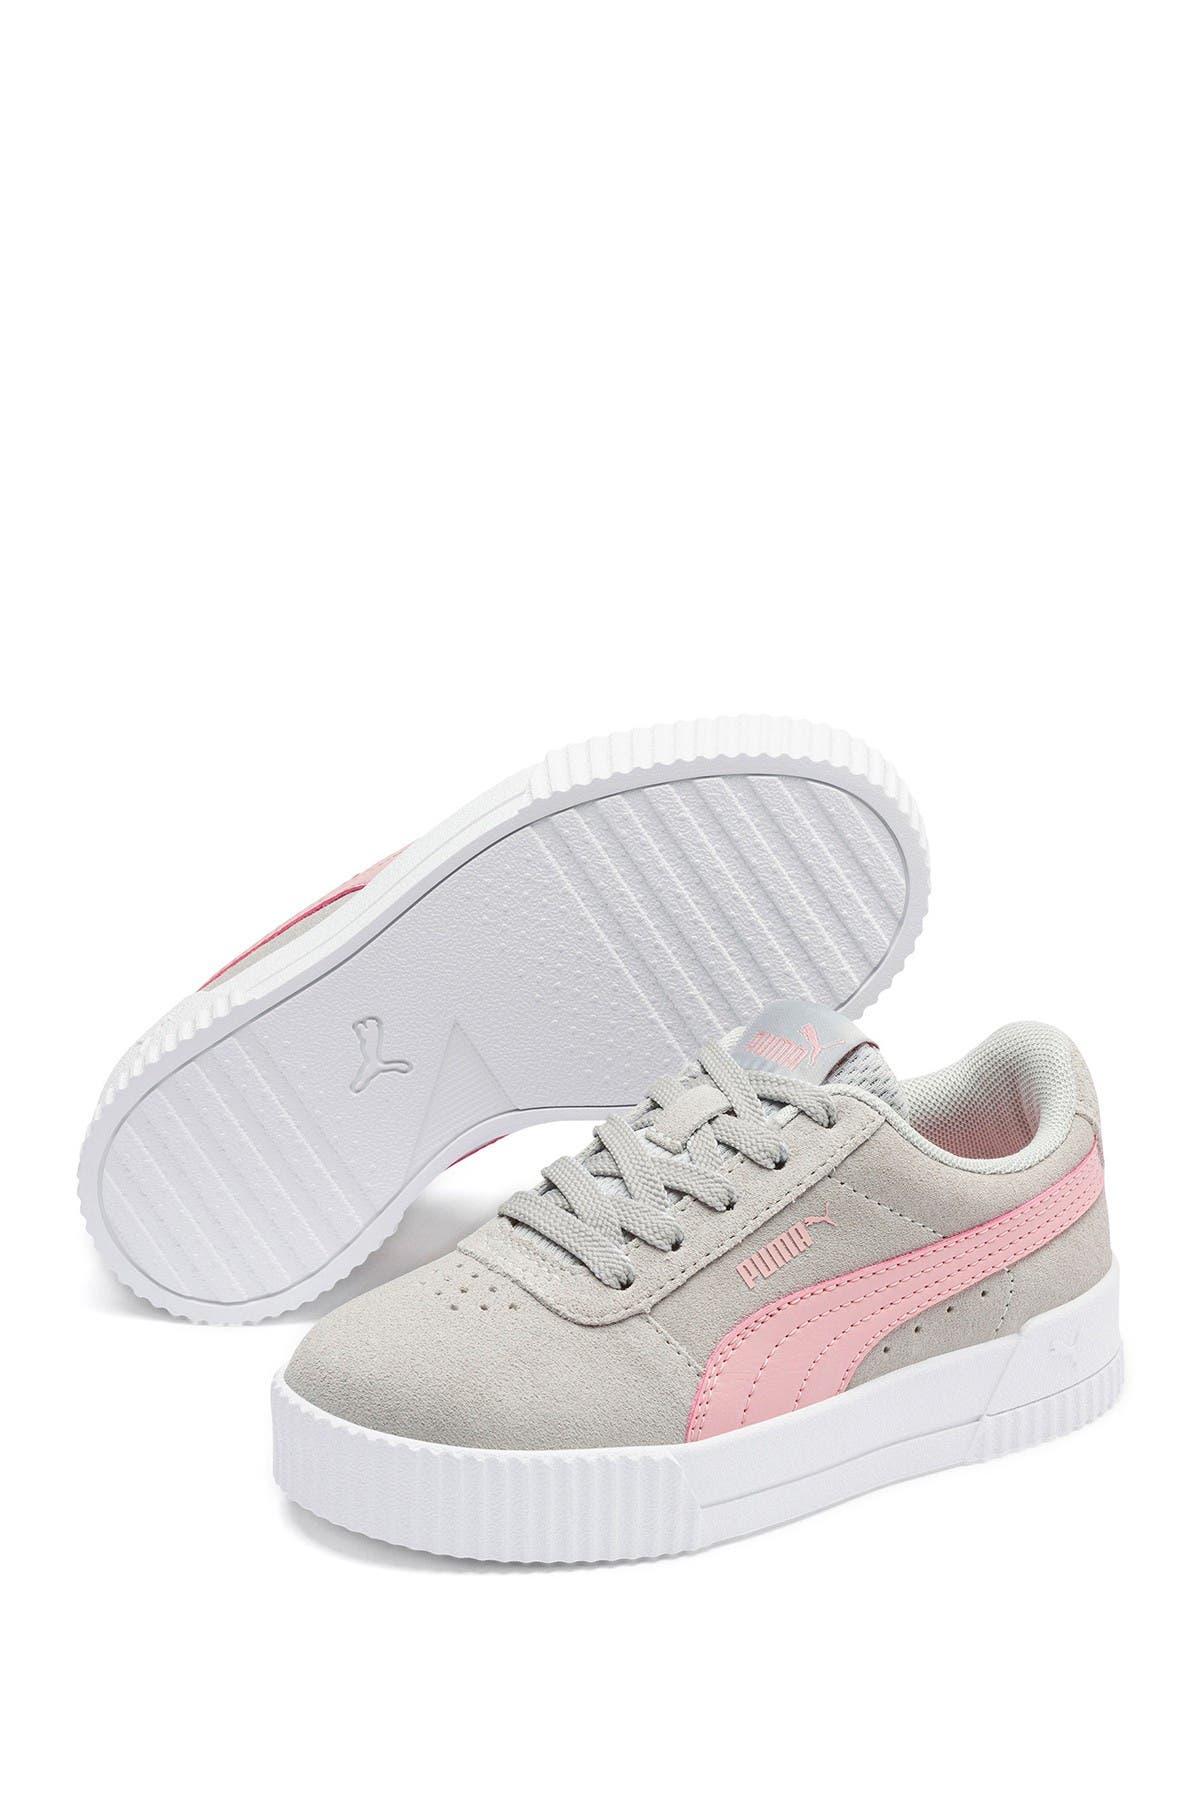 PUMA | Carina Suede Sneaker | Nordstrom